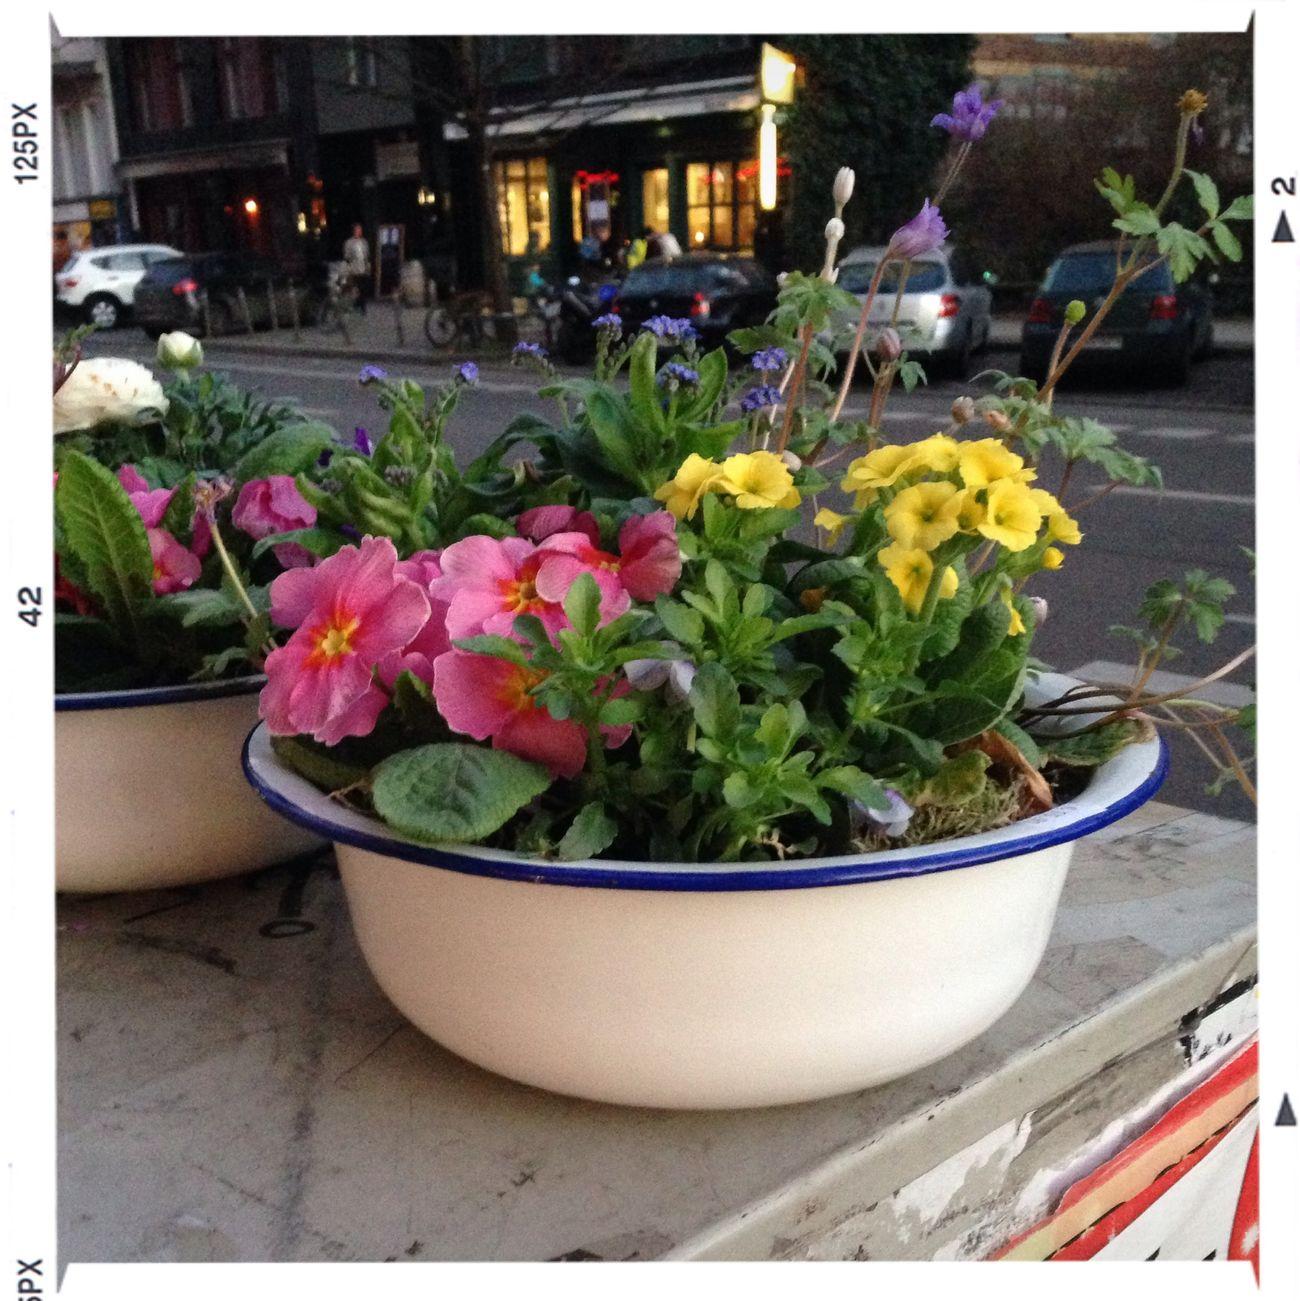 Frühlingsfarben an jeder Ecke! Quality Time